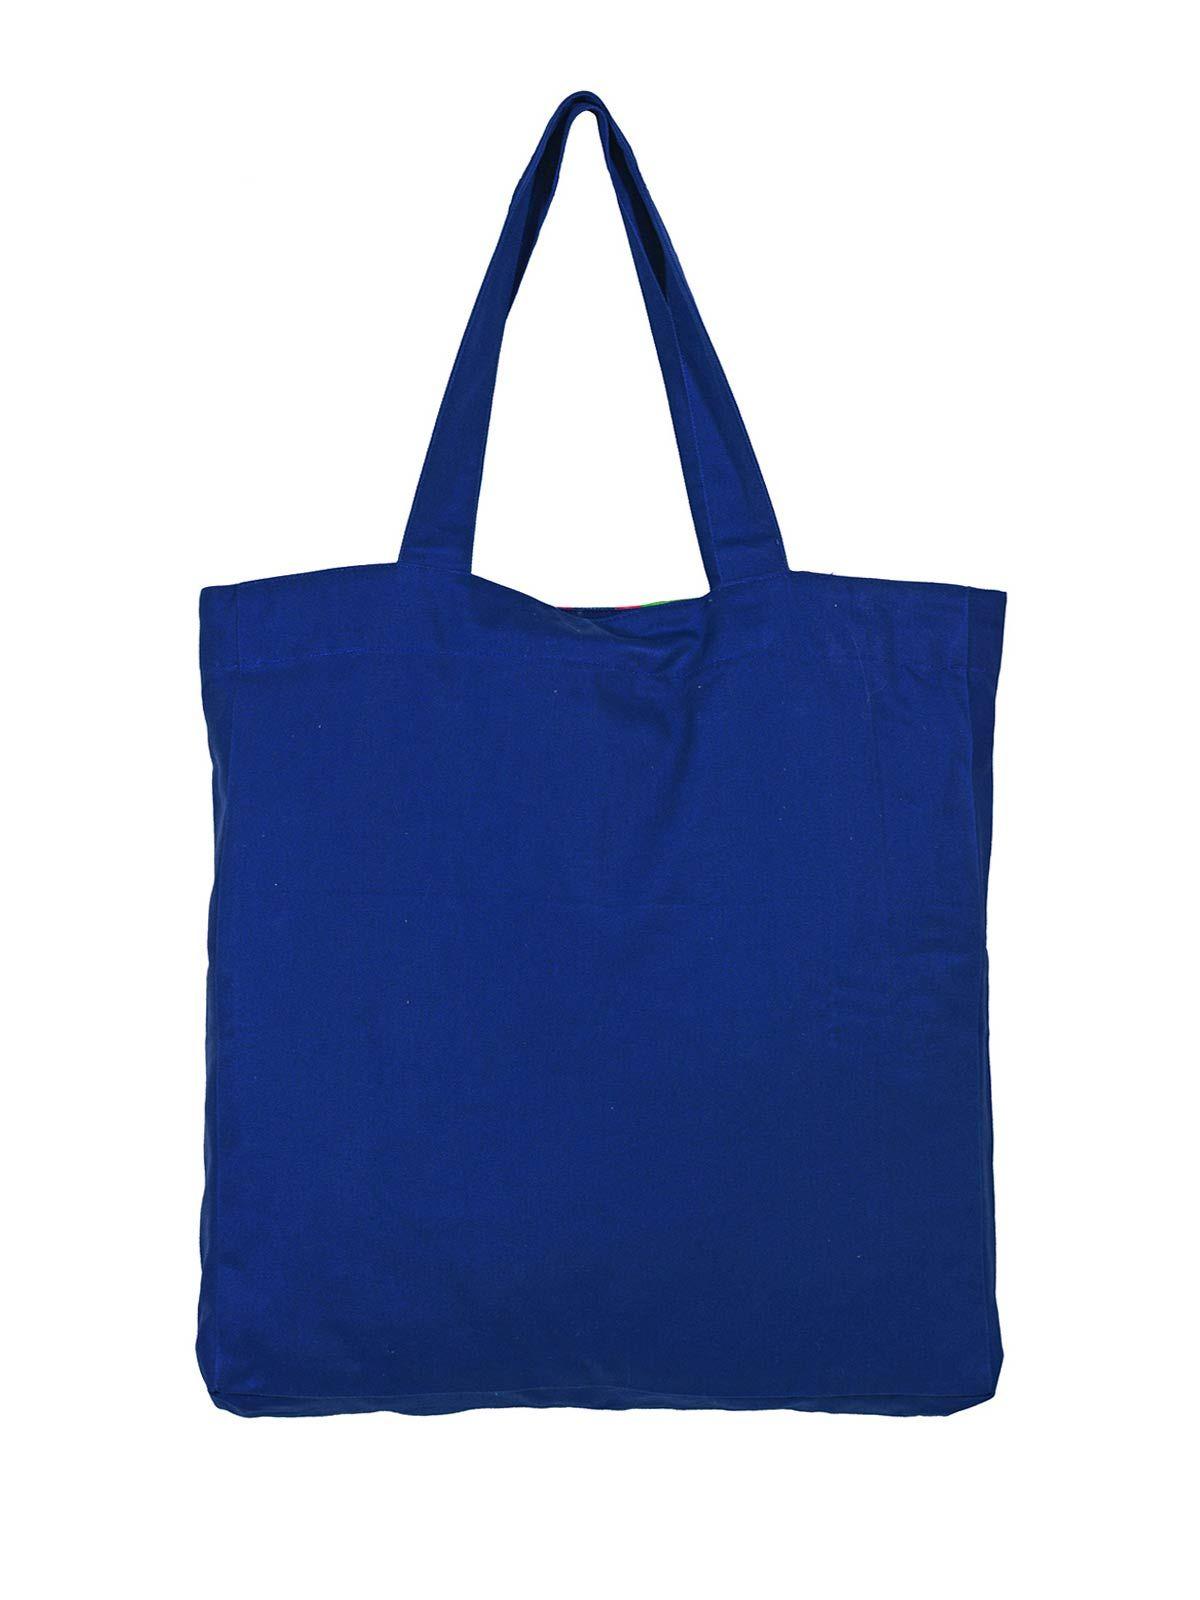 Magenta Flower Tote Bag